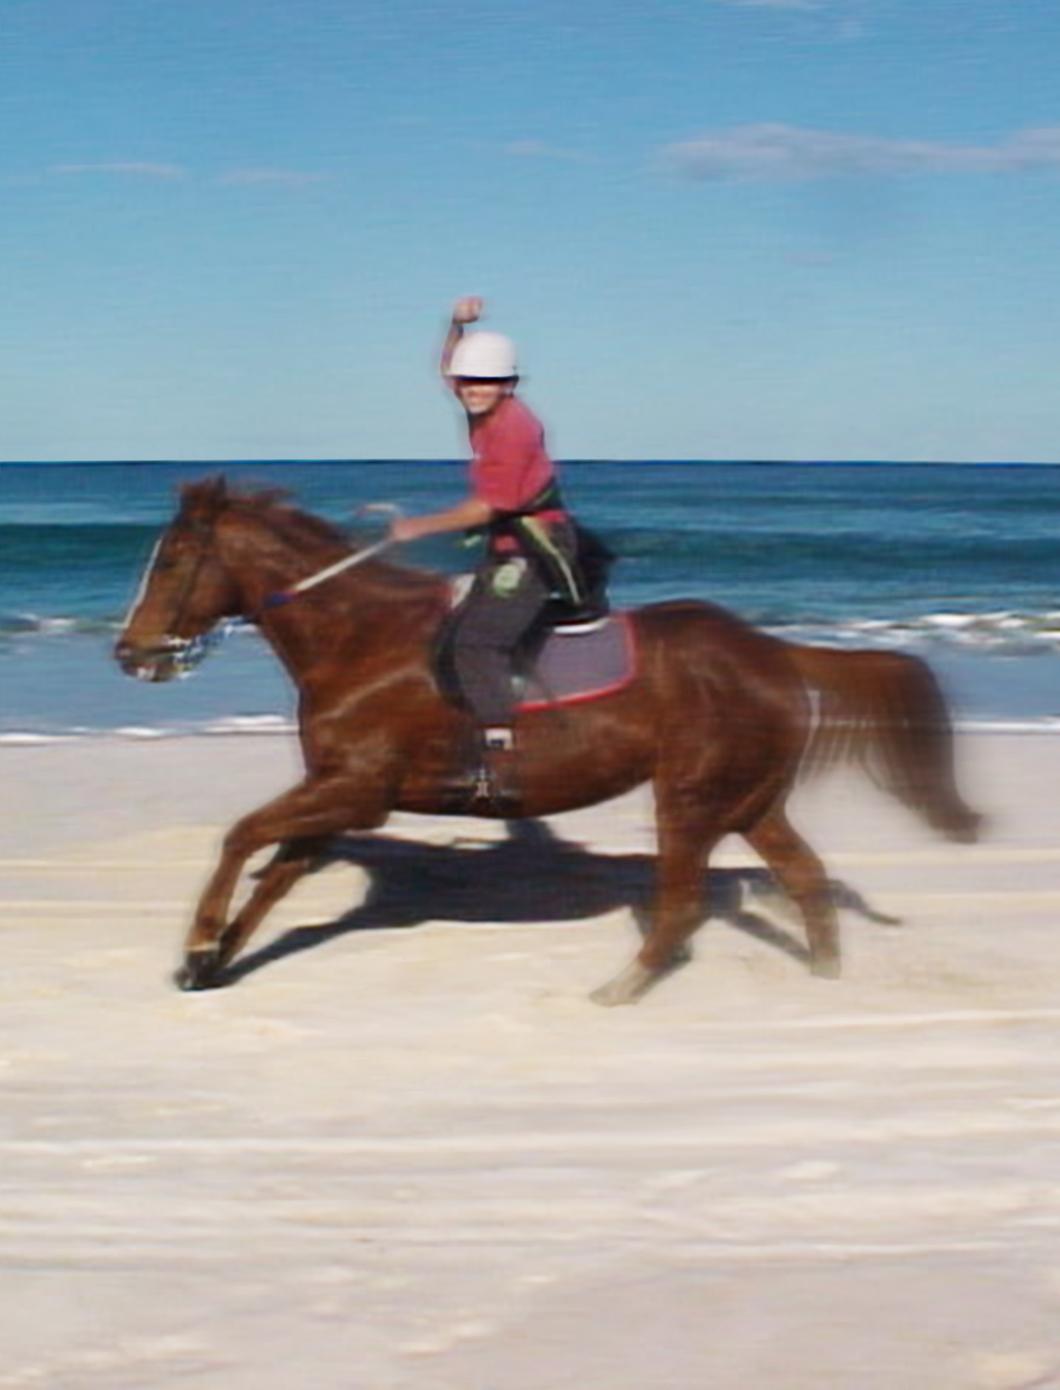 Melaleuca Seaside Retreat - Horse and Rider at the Beach